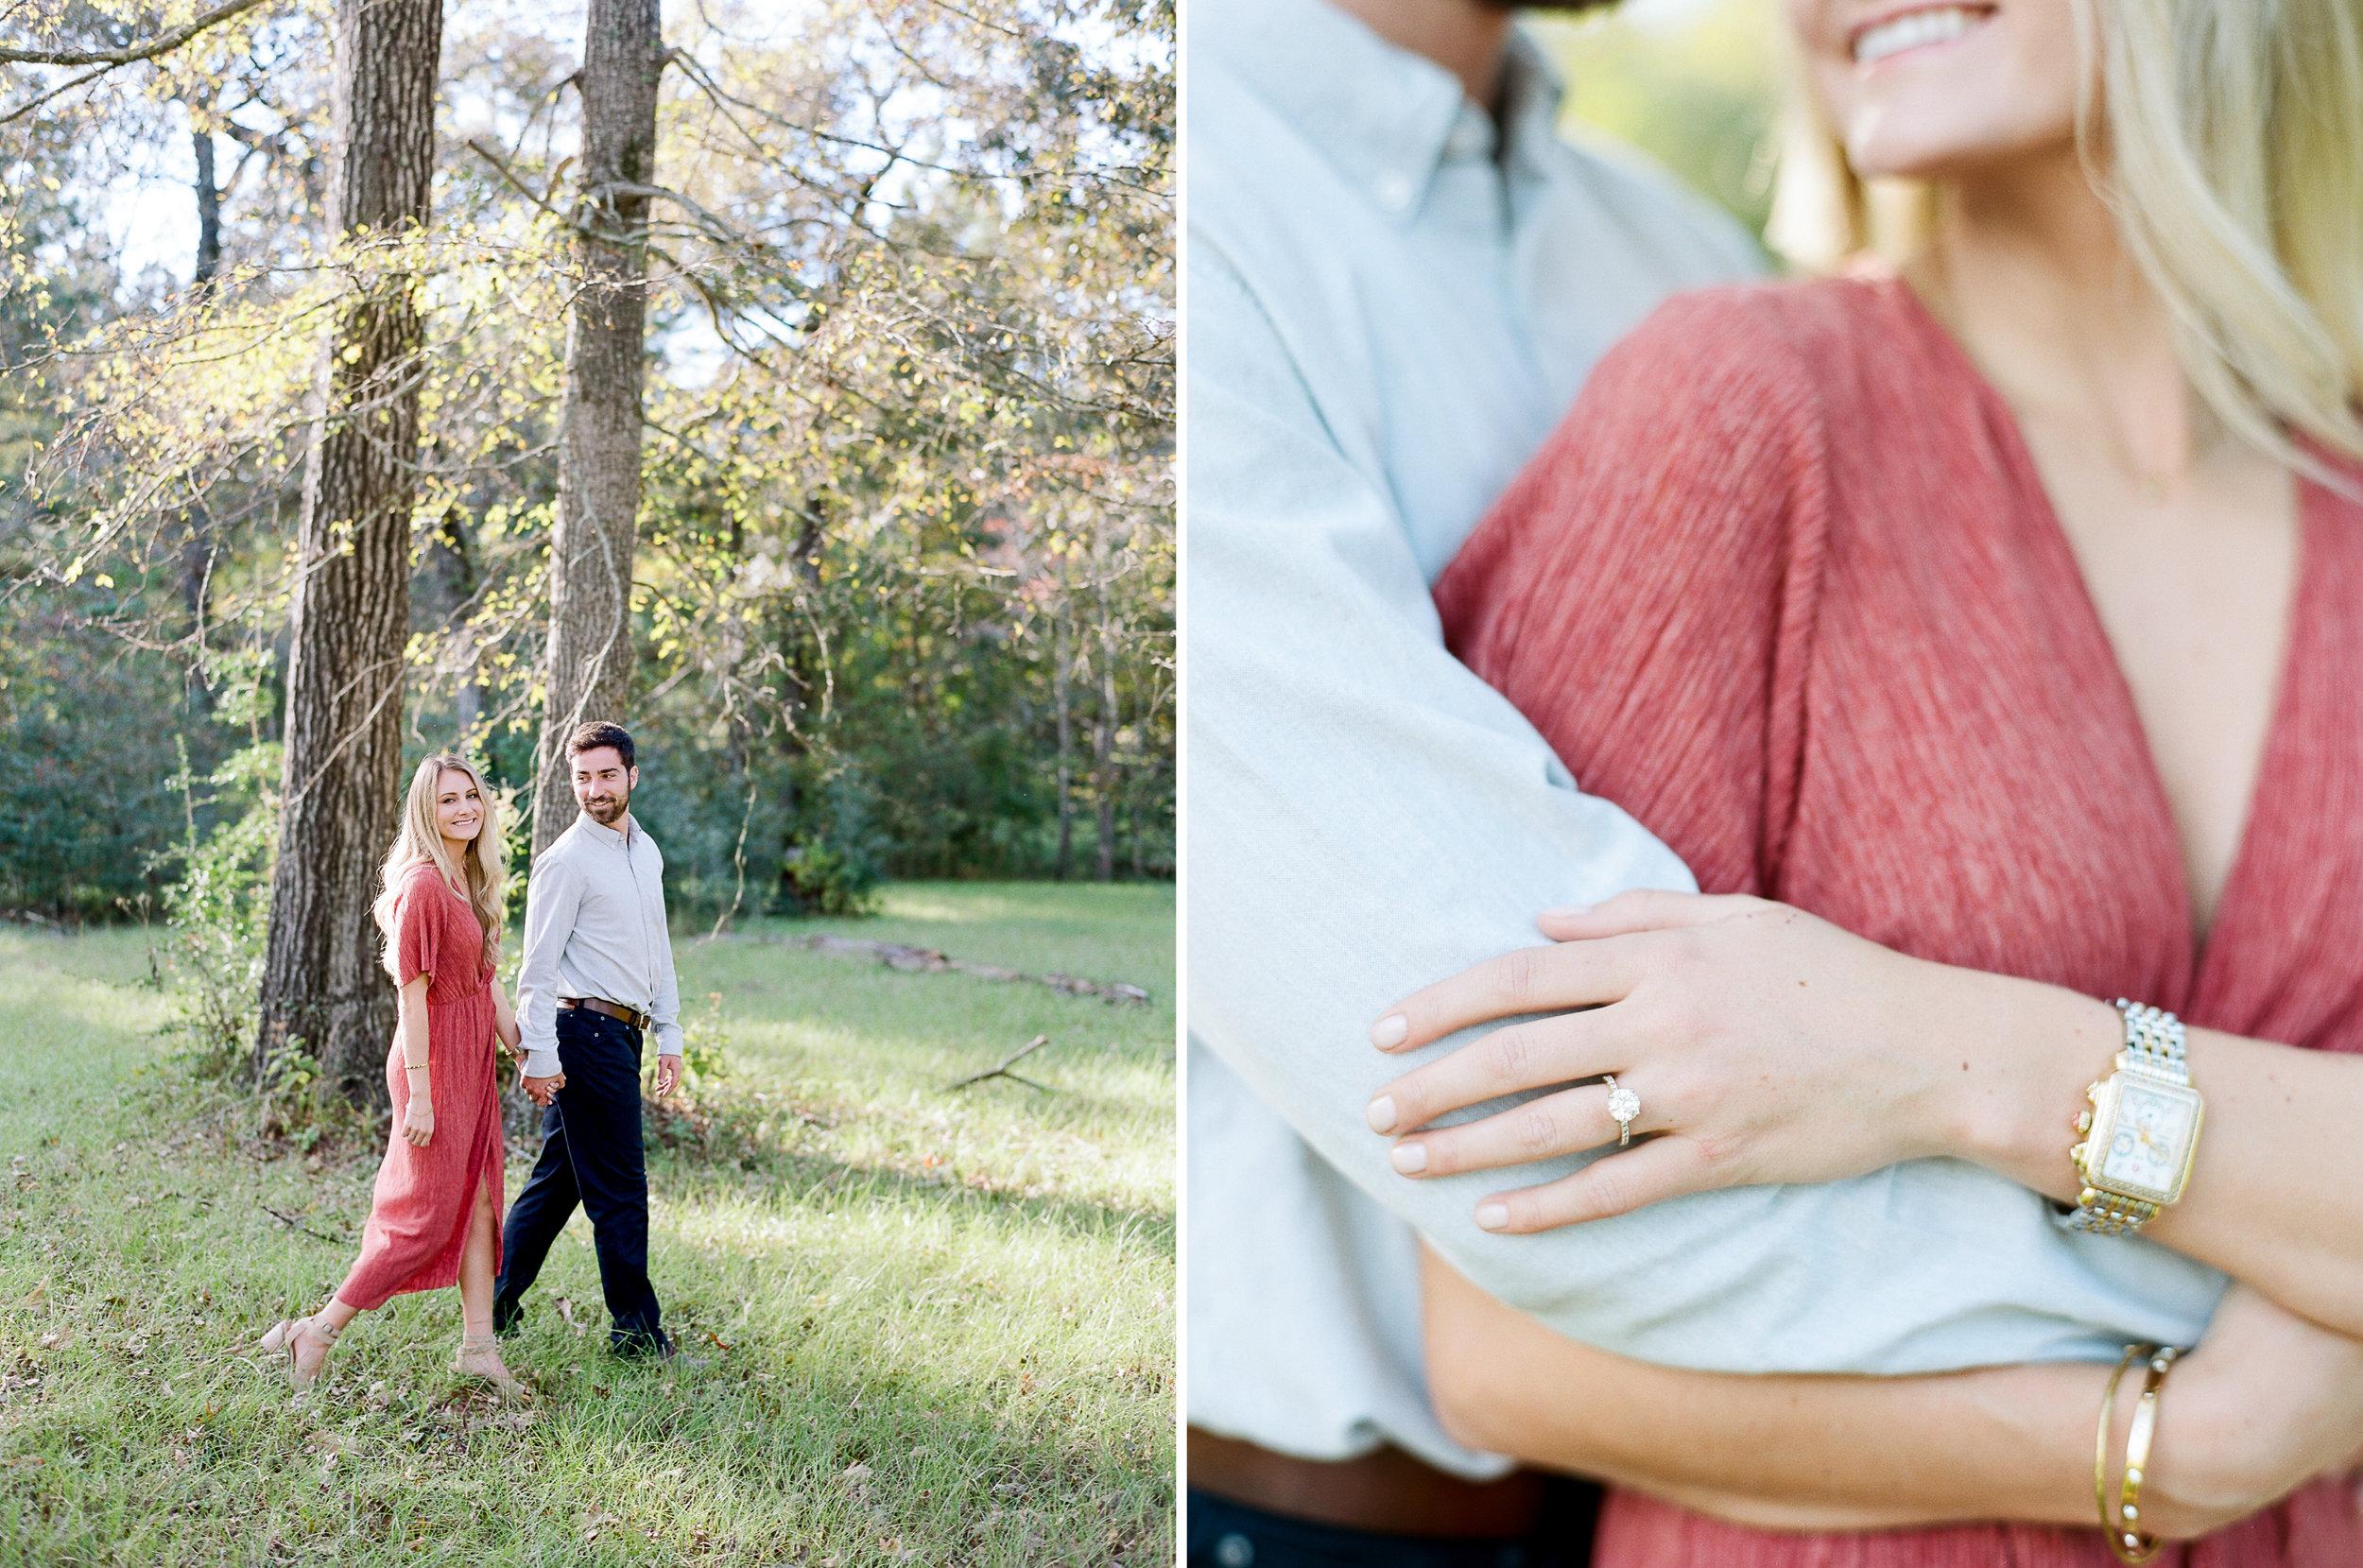 Houston-Wedding-Photographer-Best-Top-Luxury-Destination-Engagements-Portrait-Austin-Photography-104.jpg